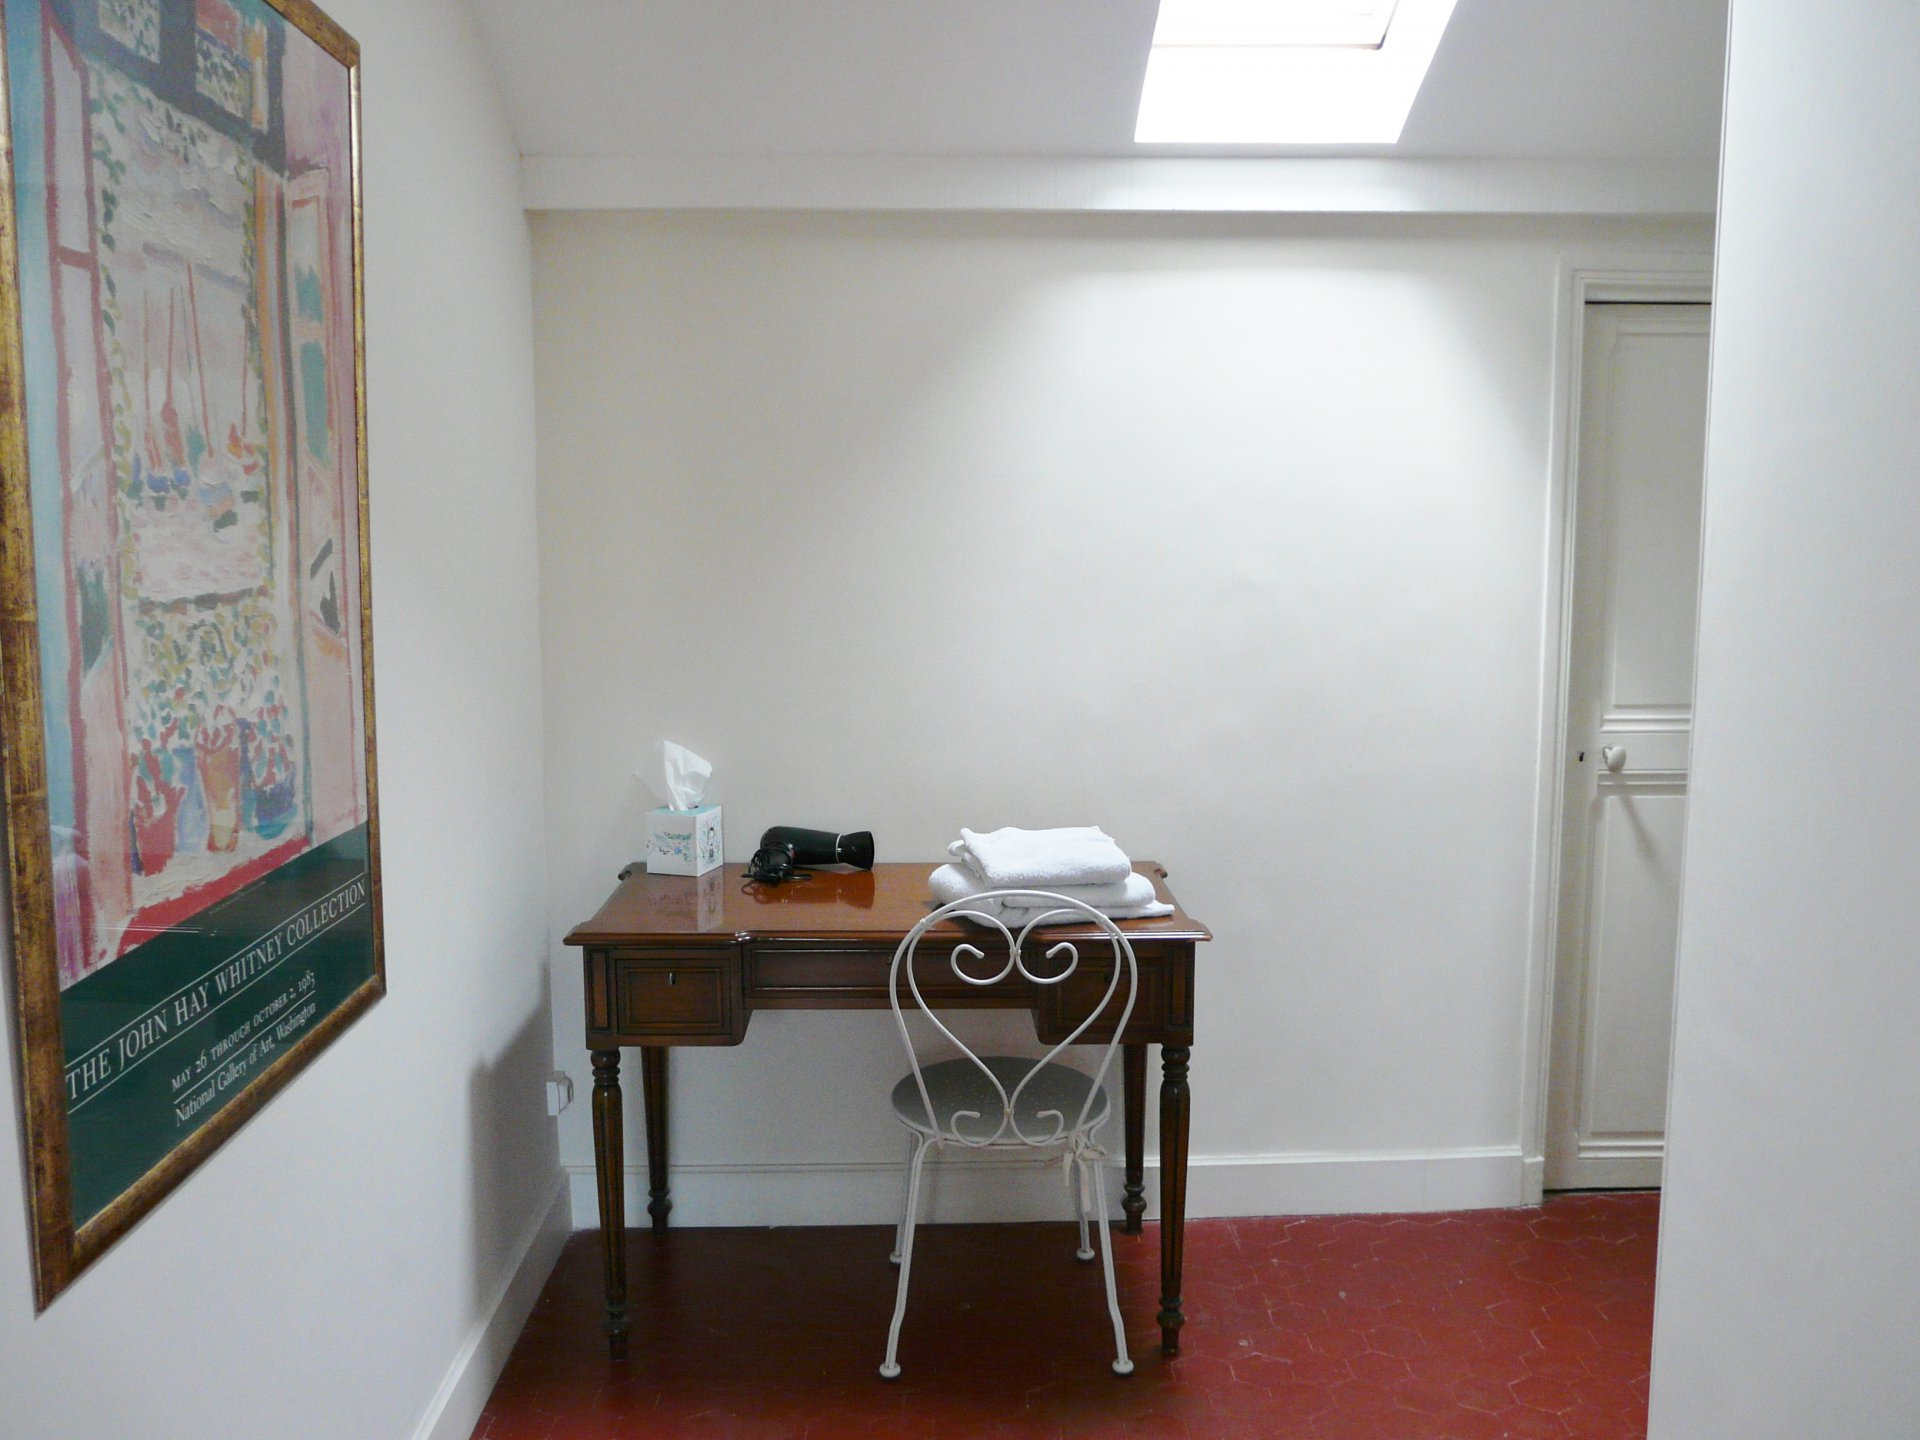 Chambre 2, skylight, wood floors, tile